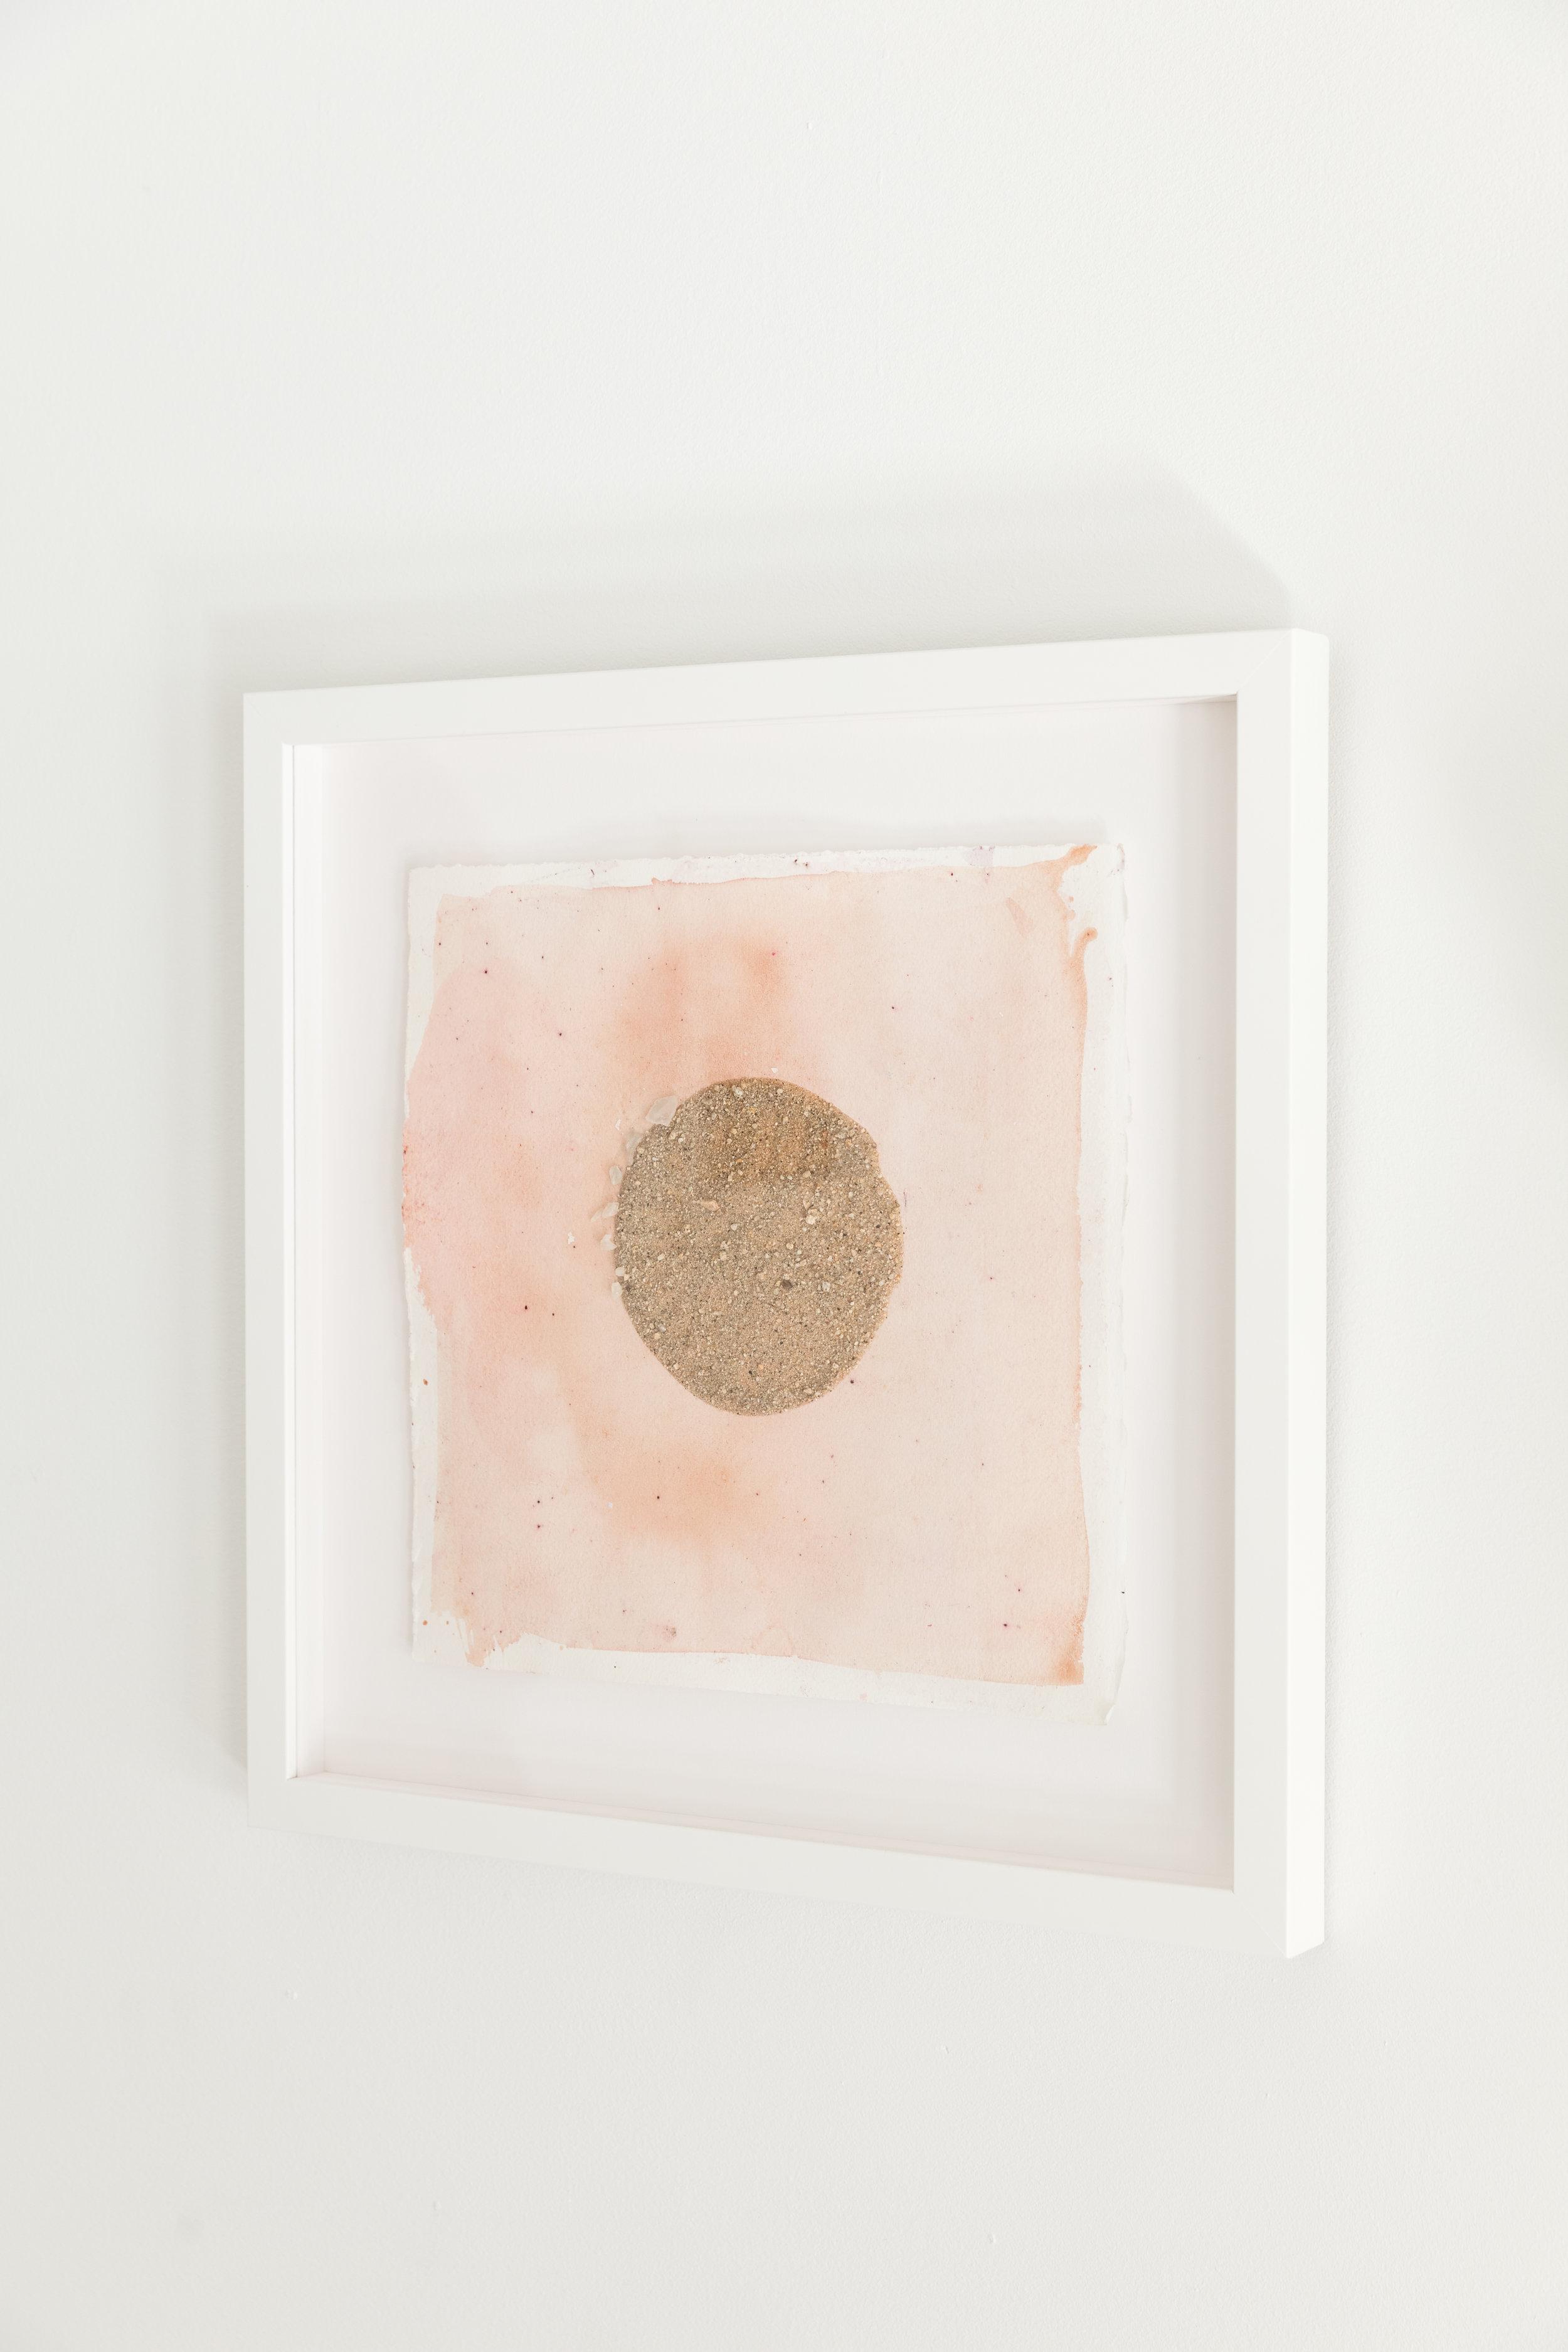 Oaxacan Sunset II  , 2017, cotton paper, brazilwood, sand, henna, 9 x 9 inches framed